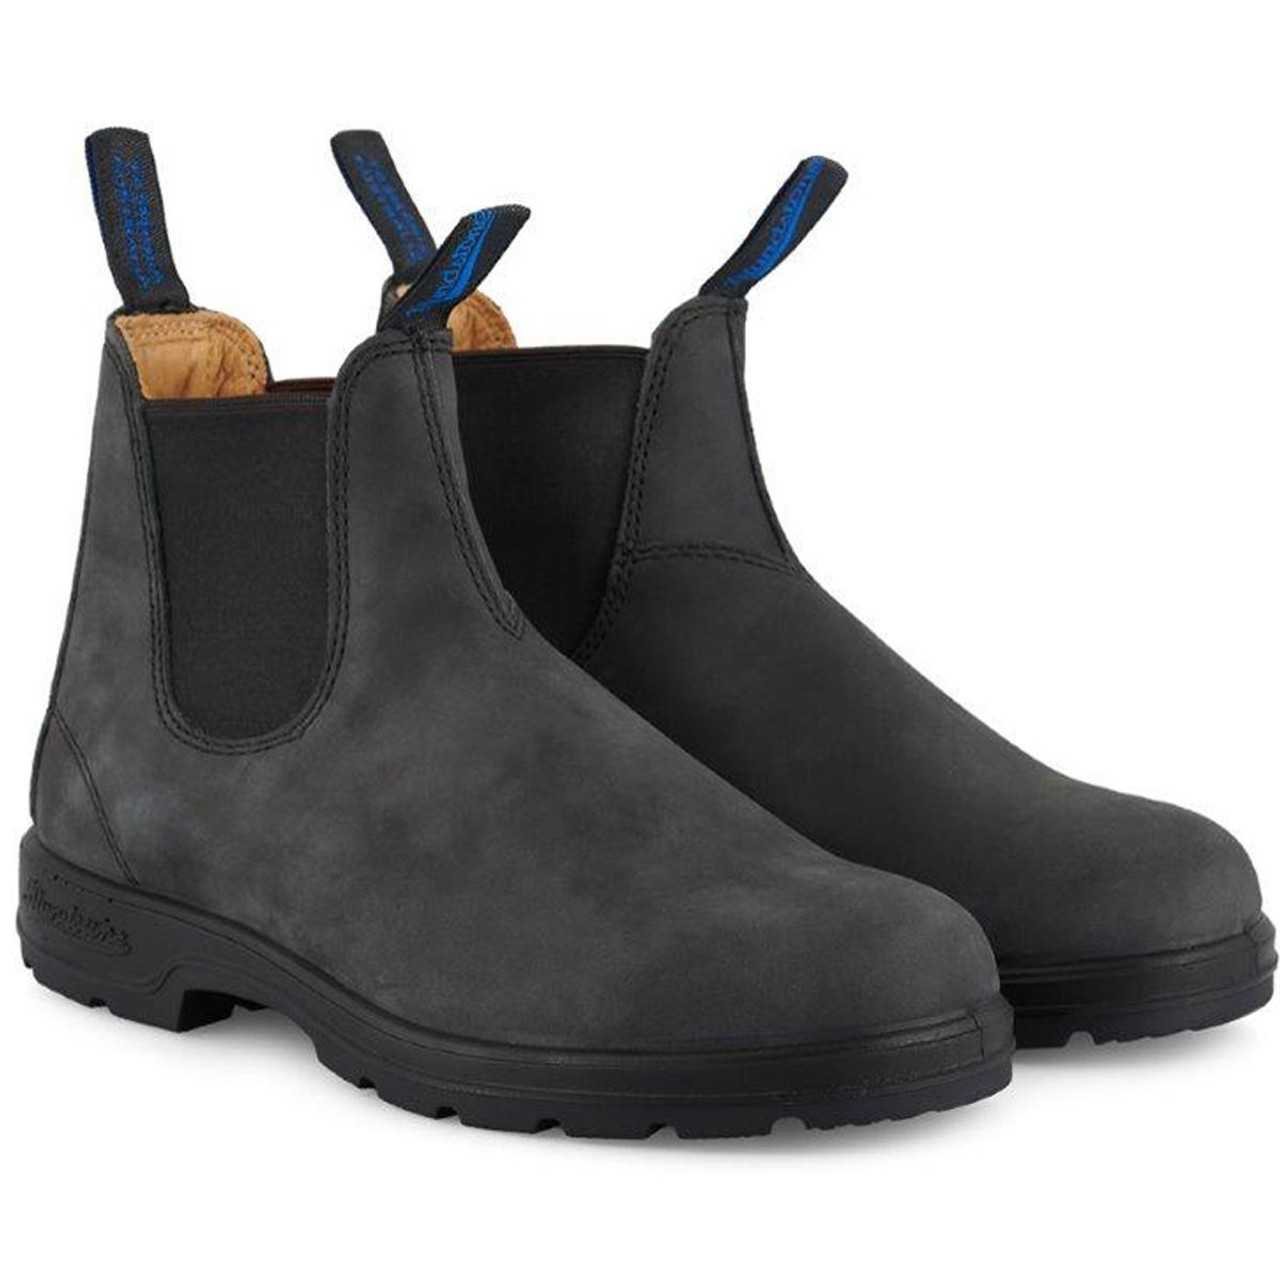 Rustic Black Blundstone Chelsea Boots